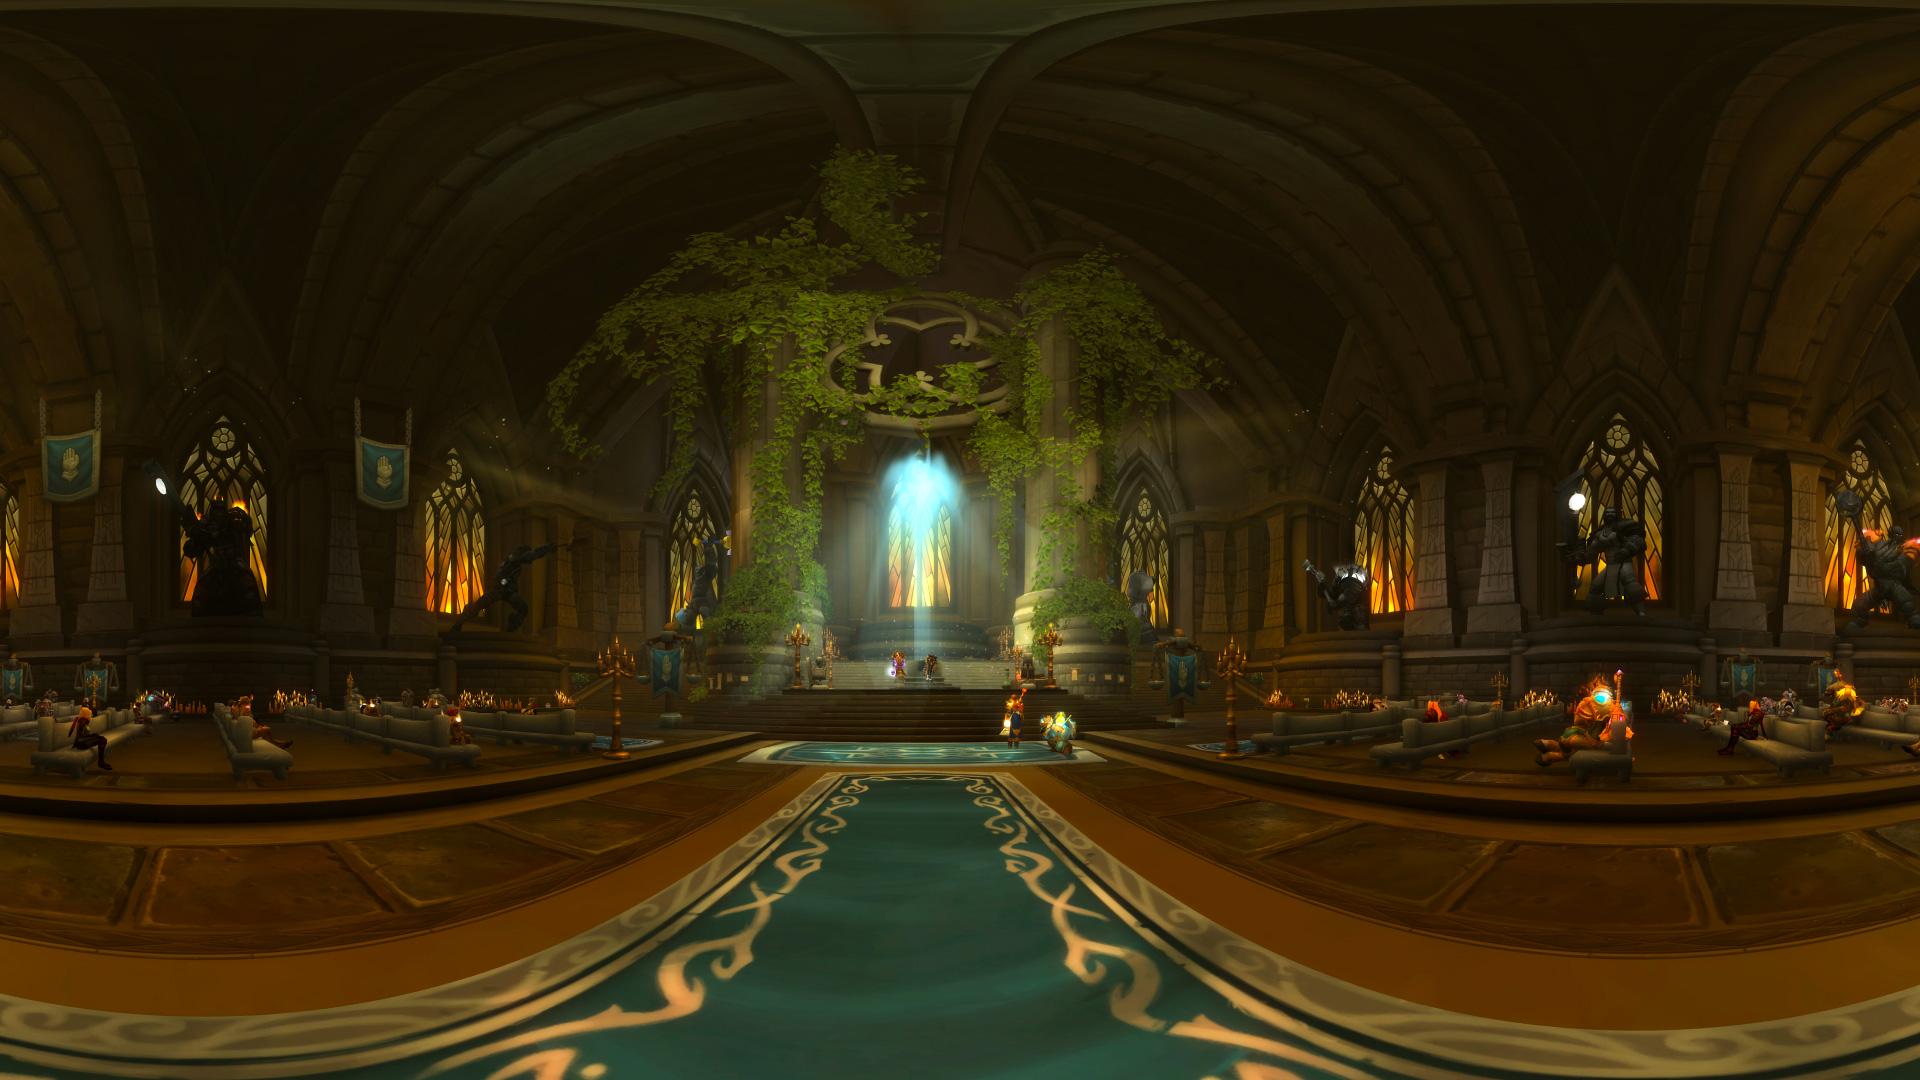 World of Warcraft 360 Panoramic Image Capture Tool